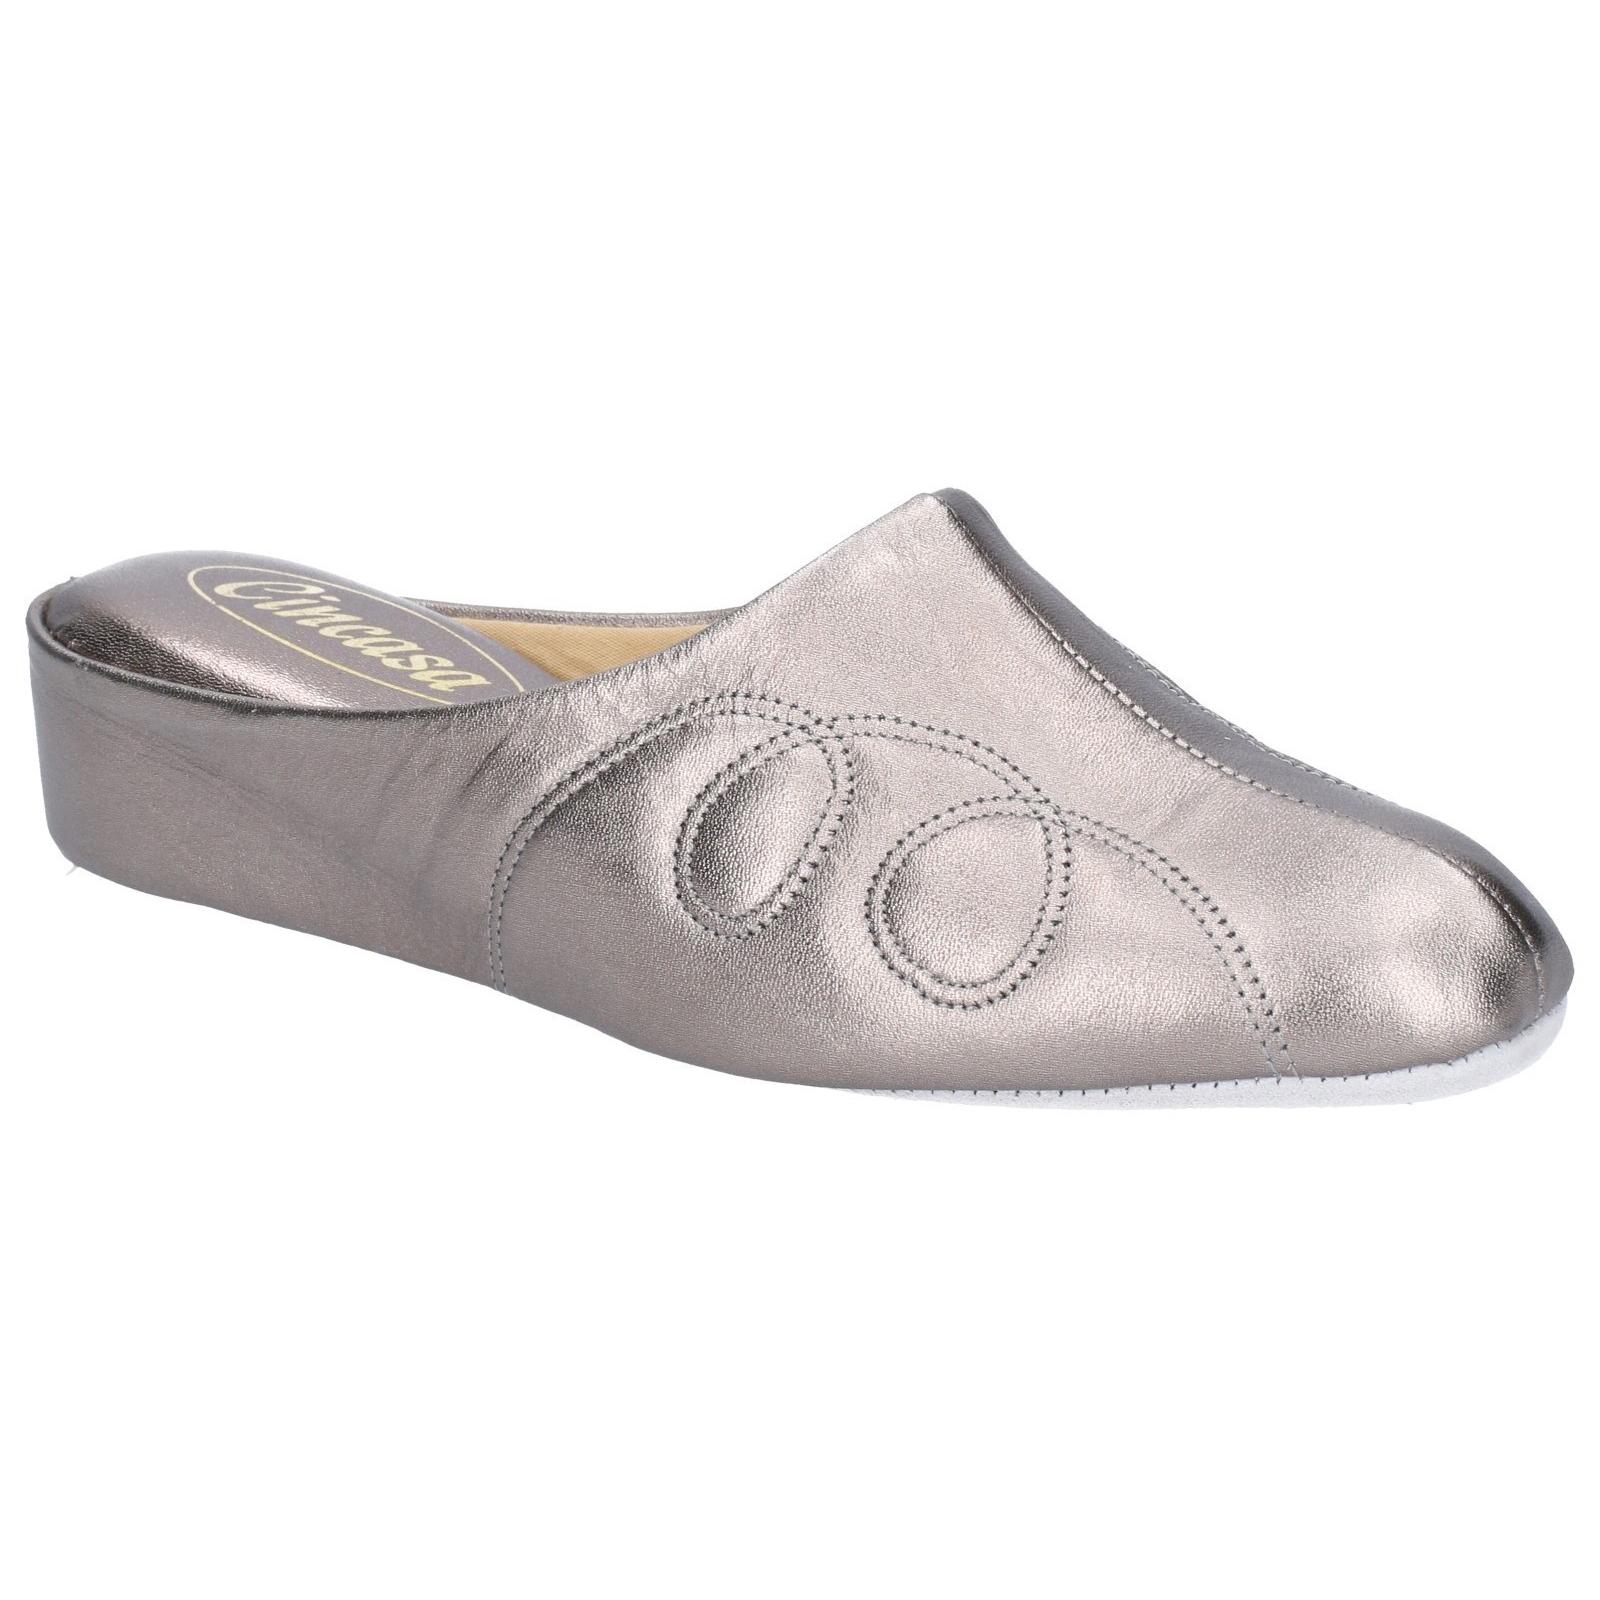 Mahon Slippers